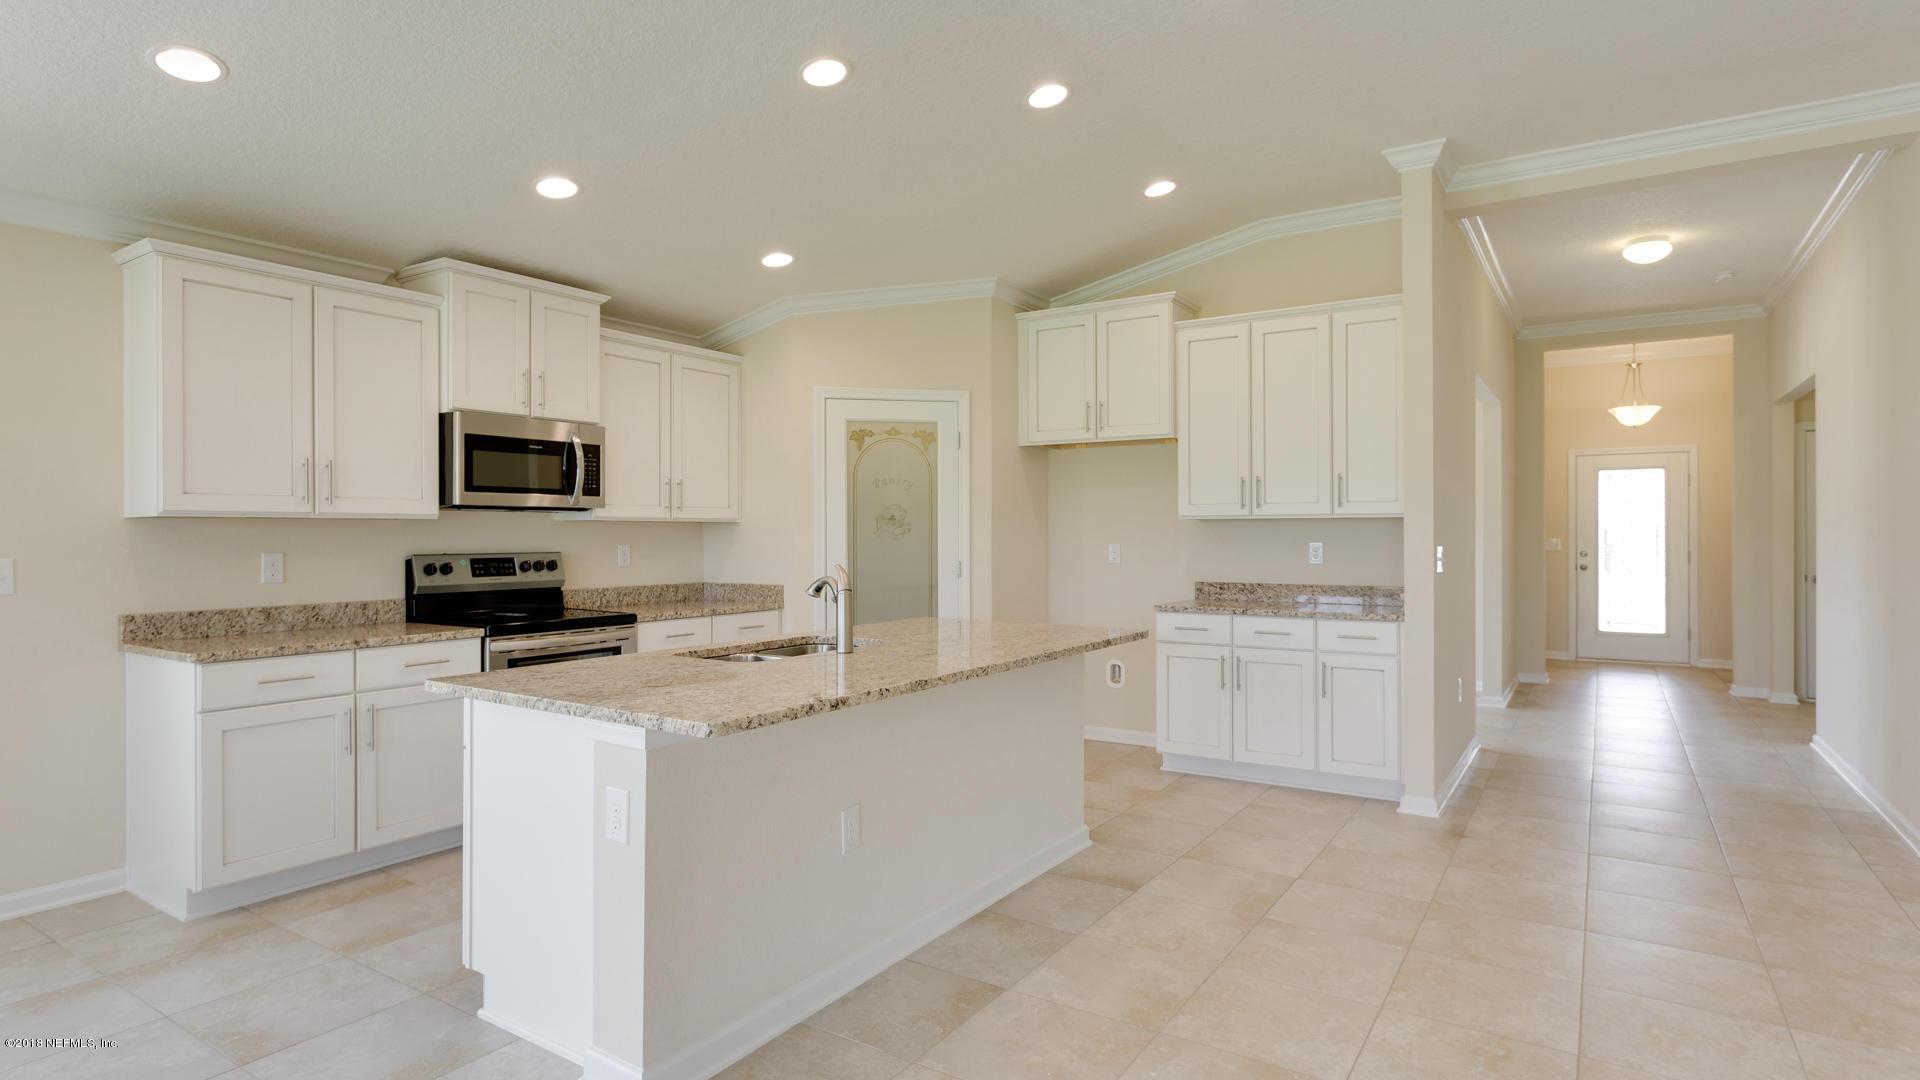 4138 FISHING CREEK, MIDDLEBURG, FLORIDA 32068, 4 Bedrooms Bedrooms, ,2 BathroomsBathrooms,Residential - single family,For sale,FISHING CREEK,943952